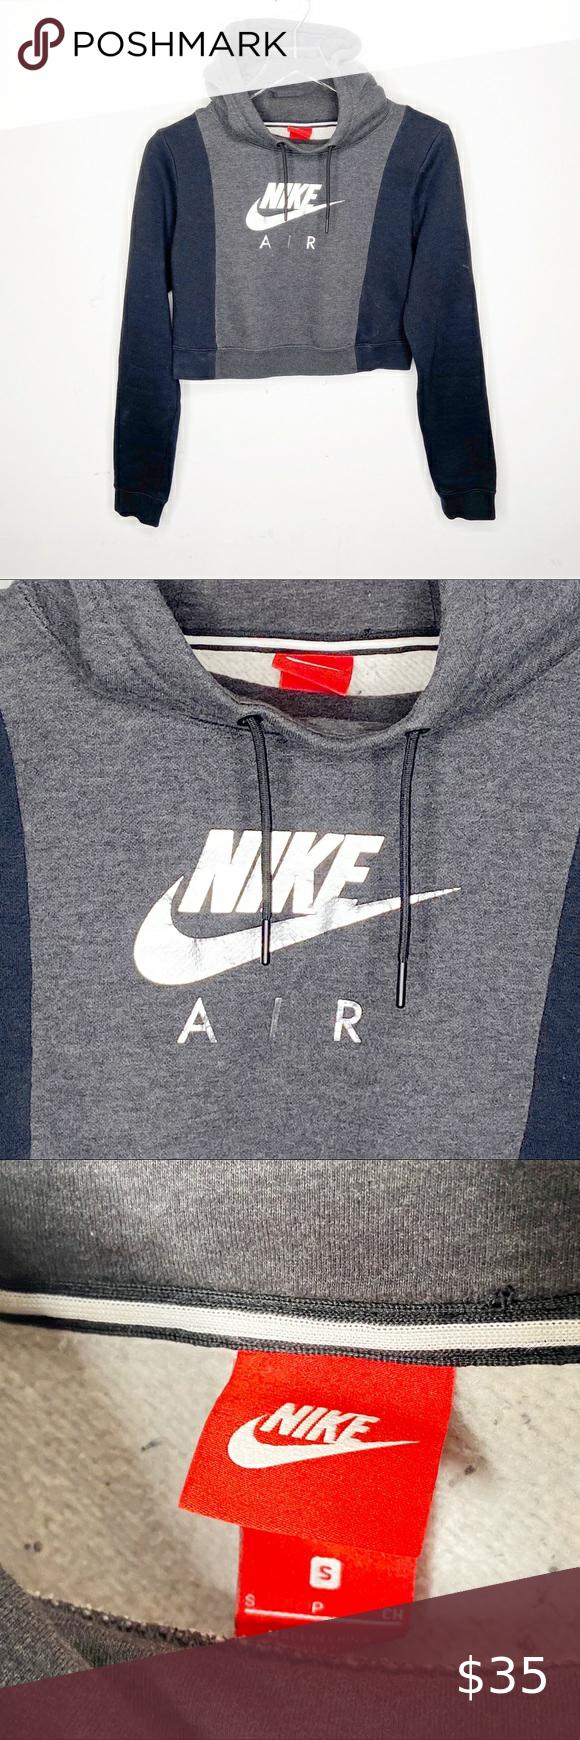 Nike Air Rally Cropped Color Block Sweatshirt Hood Color Block Sweatshirt Hooded Sweatshirts Sweatshirts [ 1740 x 580 Pixel ]